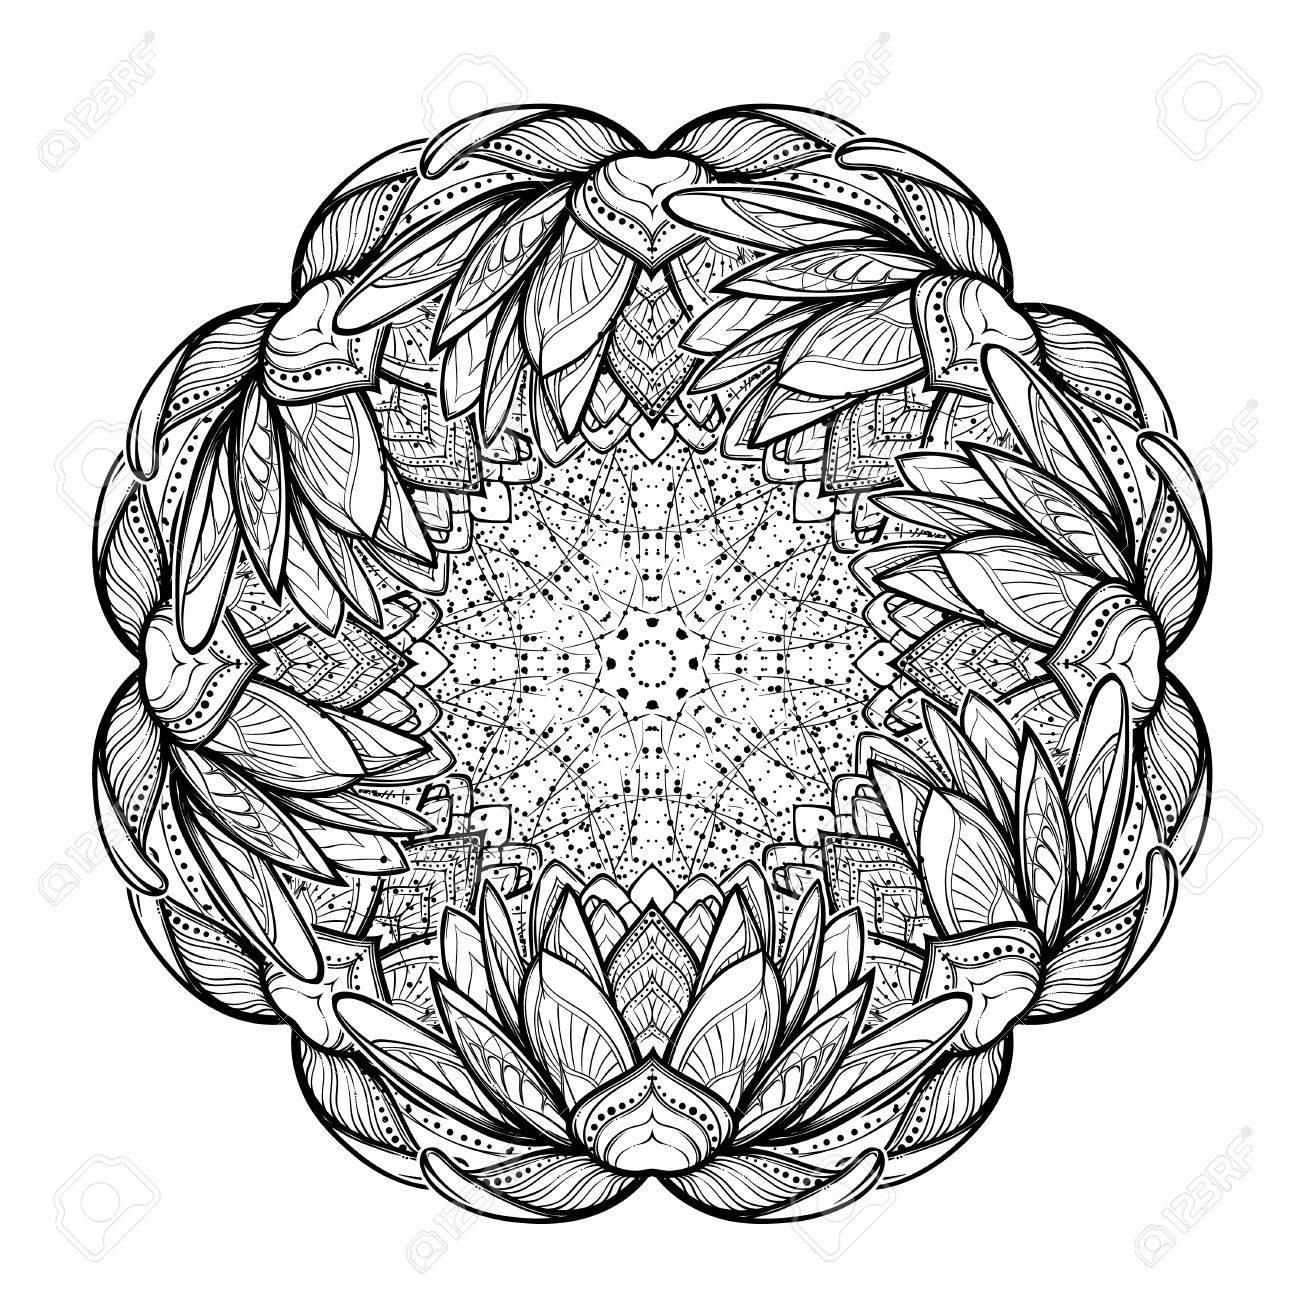 1300x1300 Lotus Flower Mandala. Intricate Stylized Linear Drawing Isolated